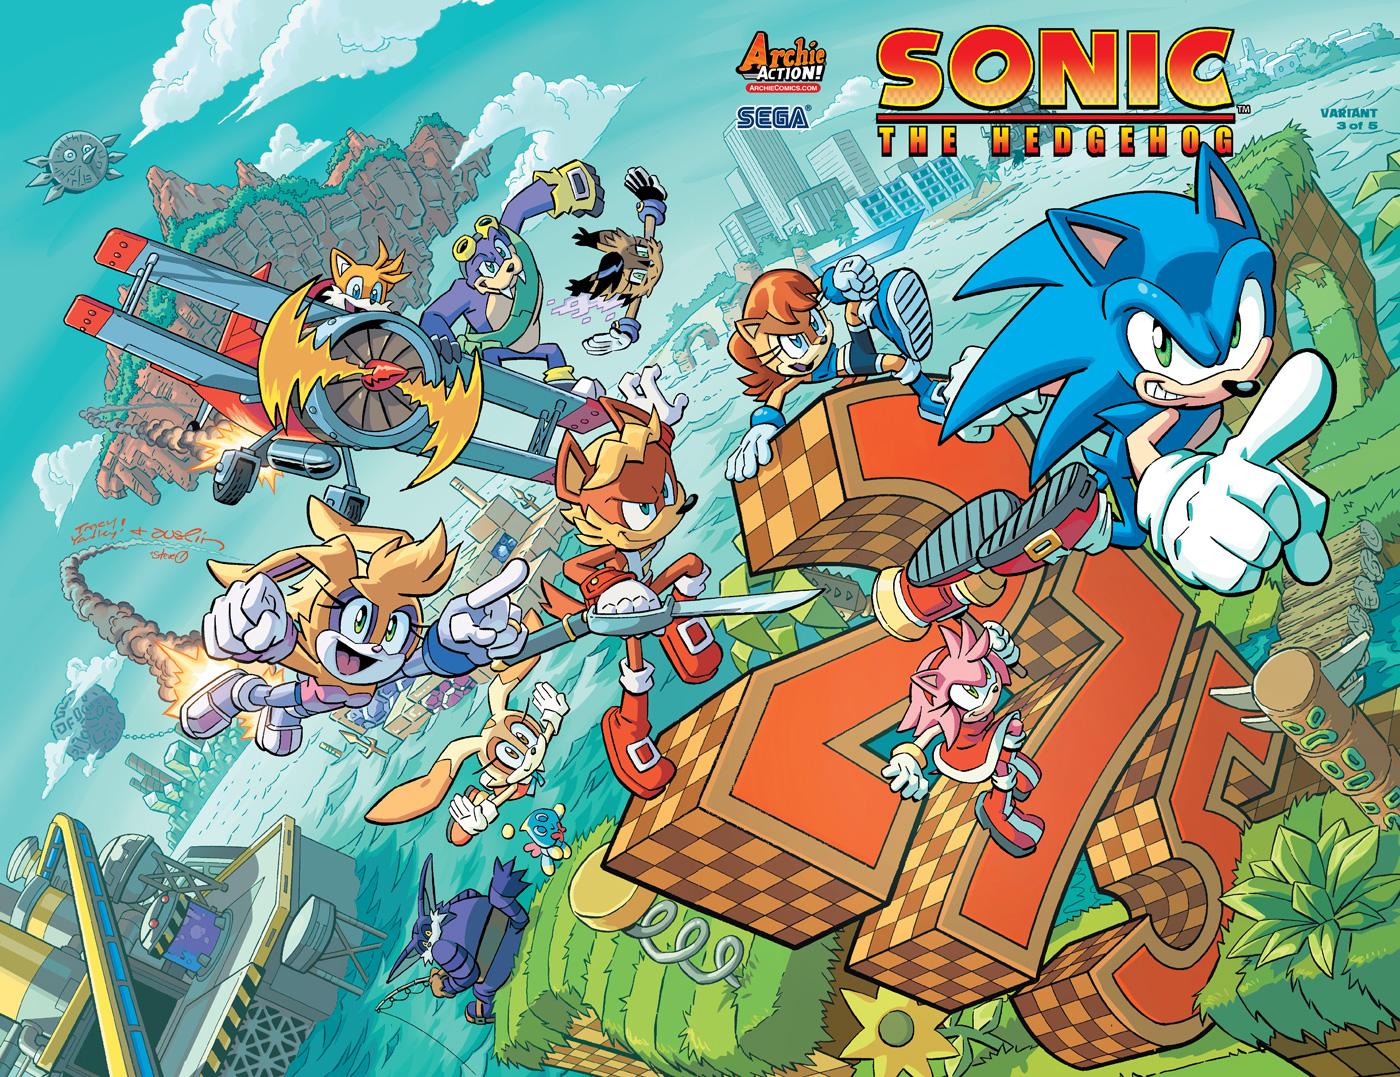 Sonic_275-0VD - Archie Comics